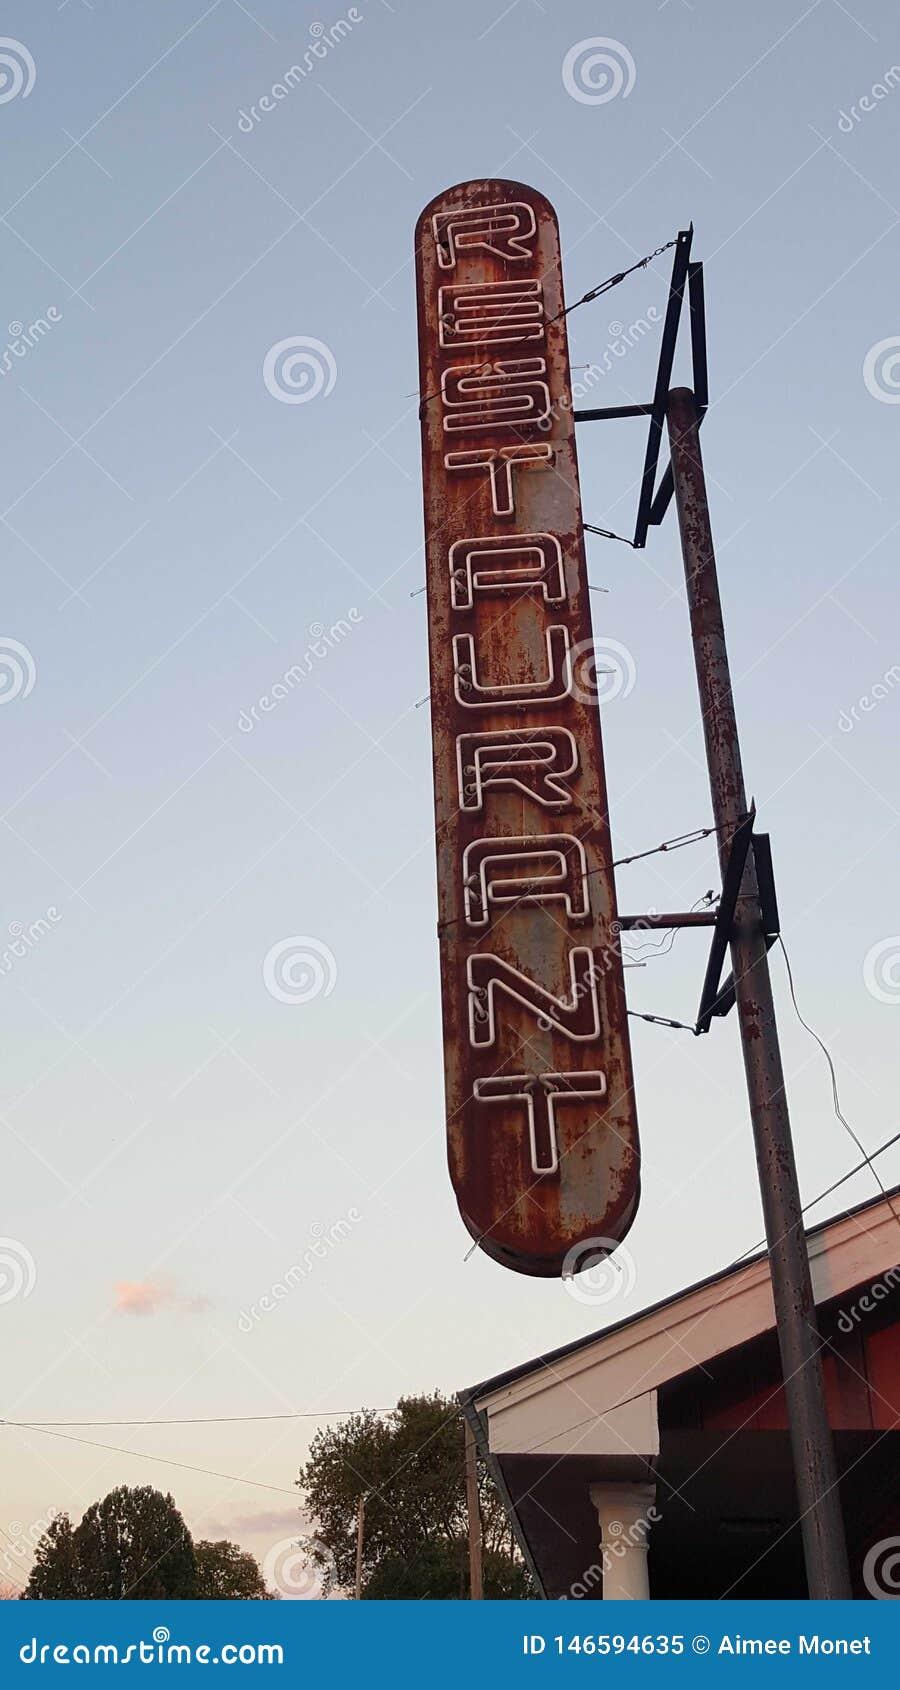 Osamotniony rocznik restauracji znak